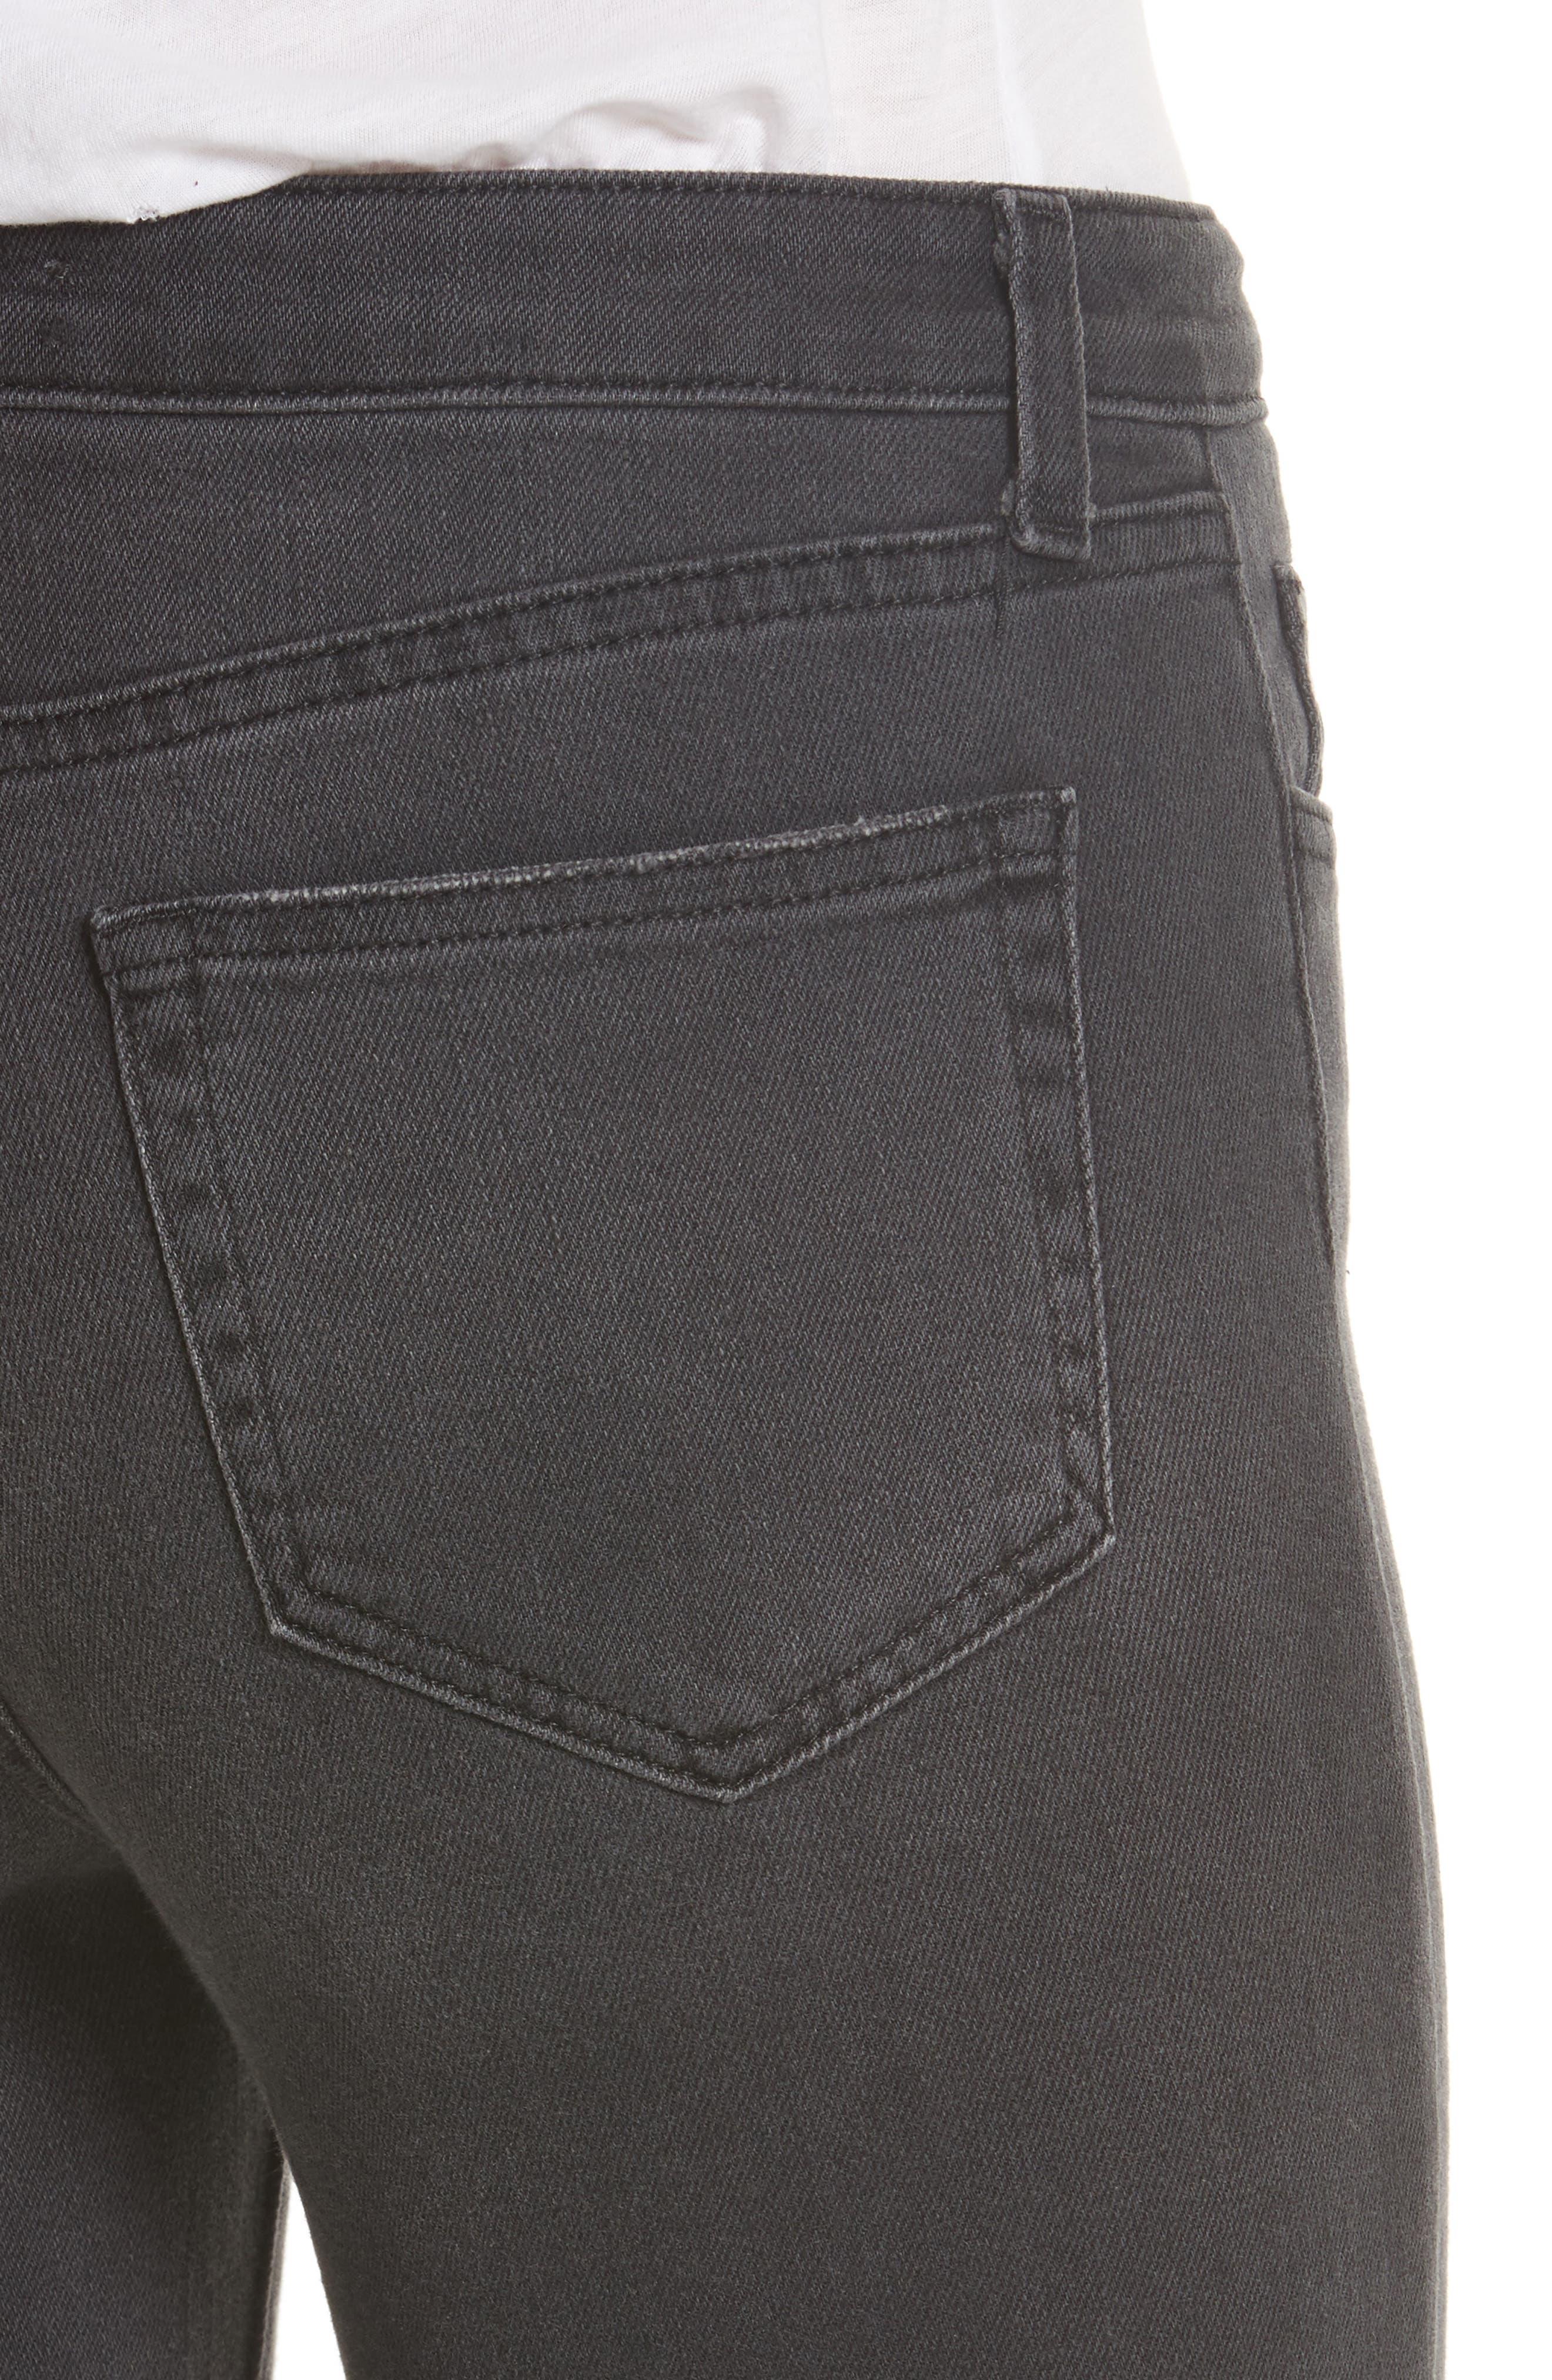 Audrina Ripped Straight Leg Jeans,                             Alternate thumbnail 4, color,                             Vintage Black Worn Destruct